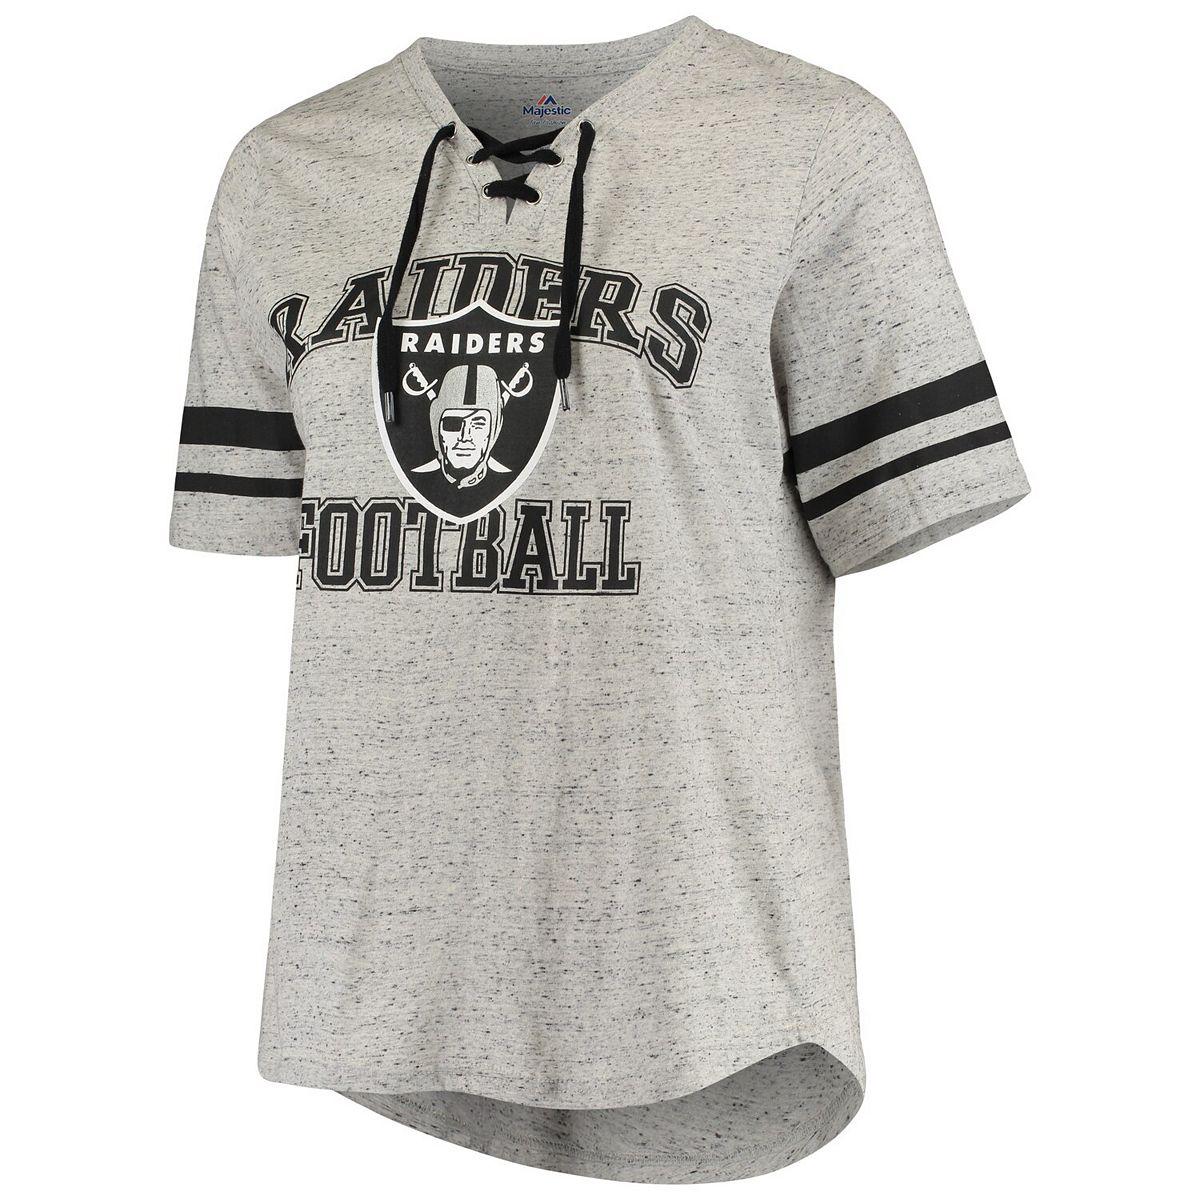 Women's Majestic Heathered Gray Oakland Raiders Plus Size Sleeve Stripe Lace-Up V-Neck T-Shirt txDos